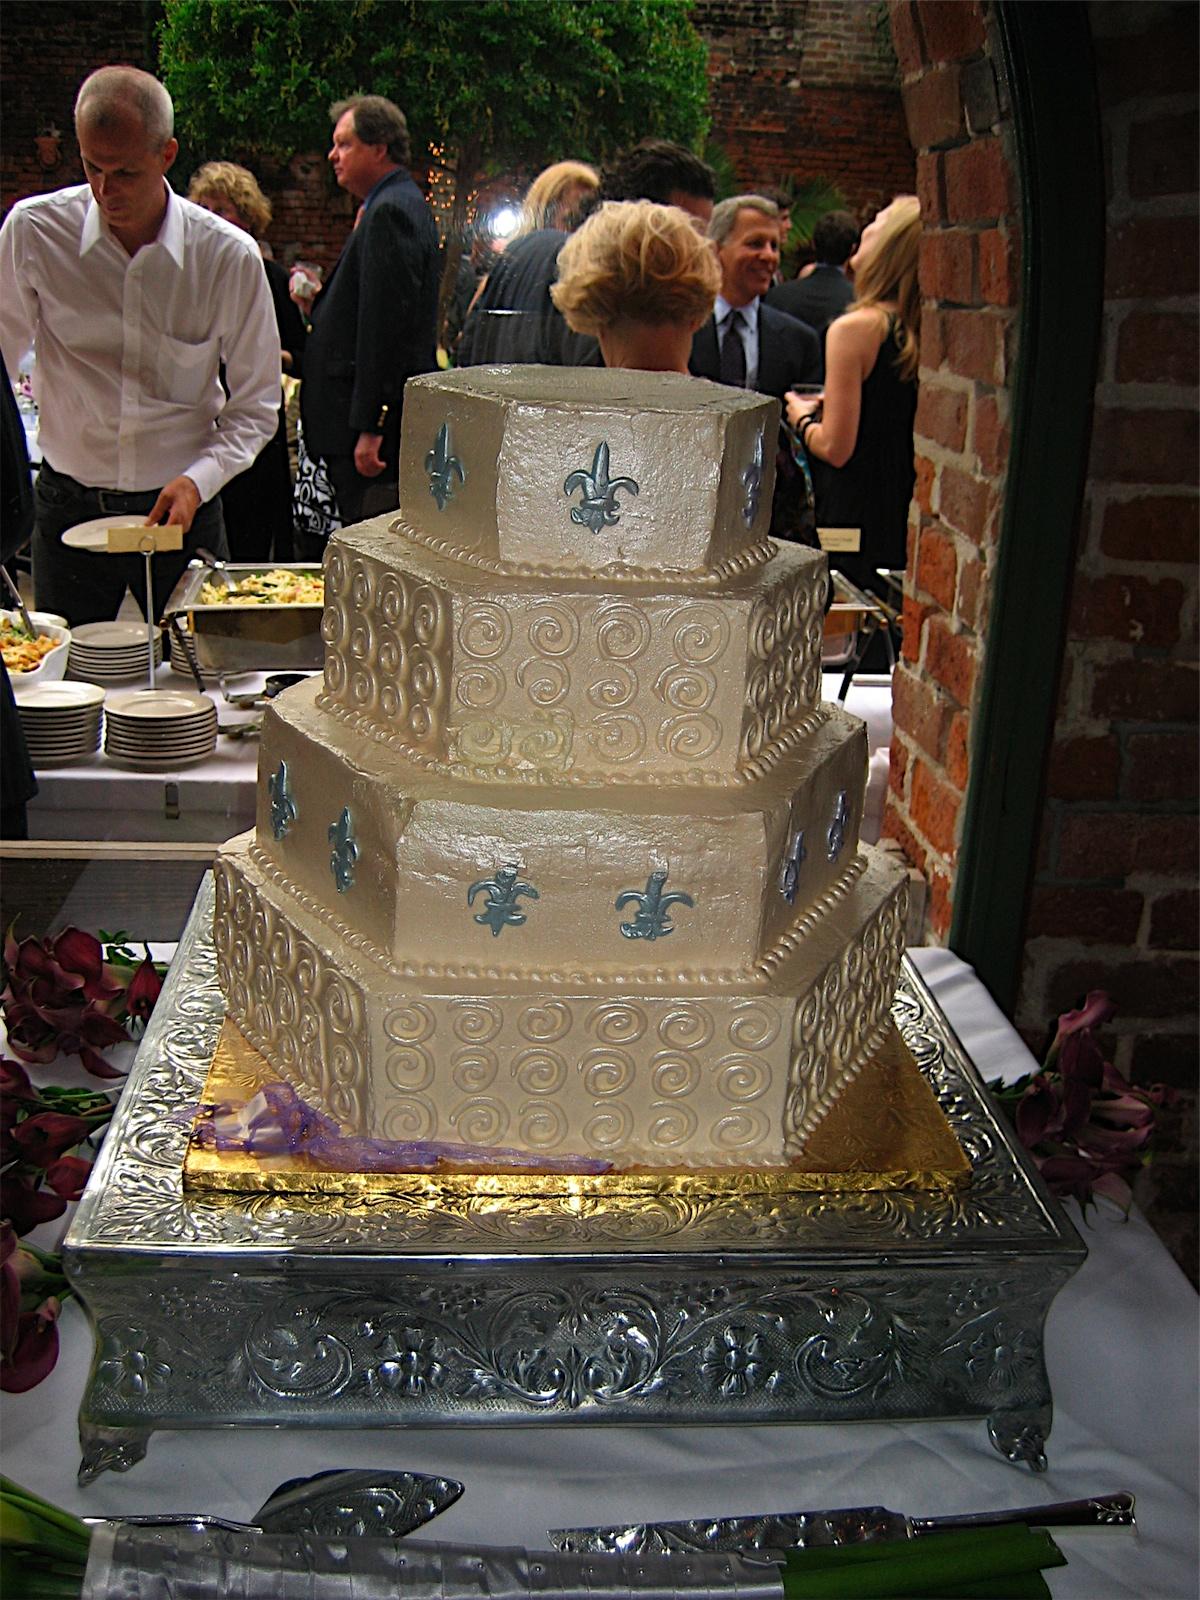 sea blue see green my wedding Wednesday the cake